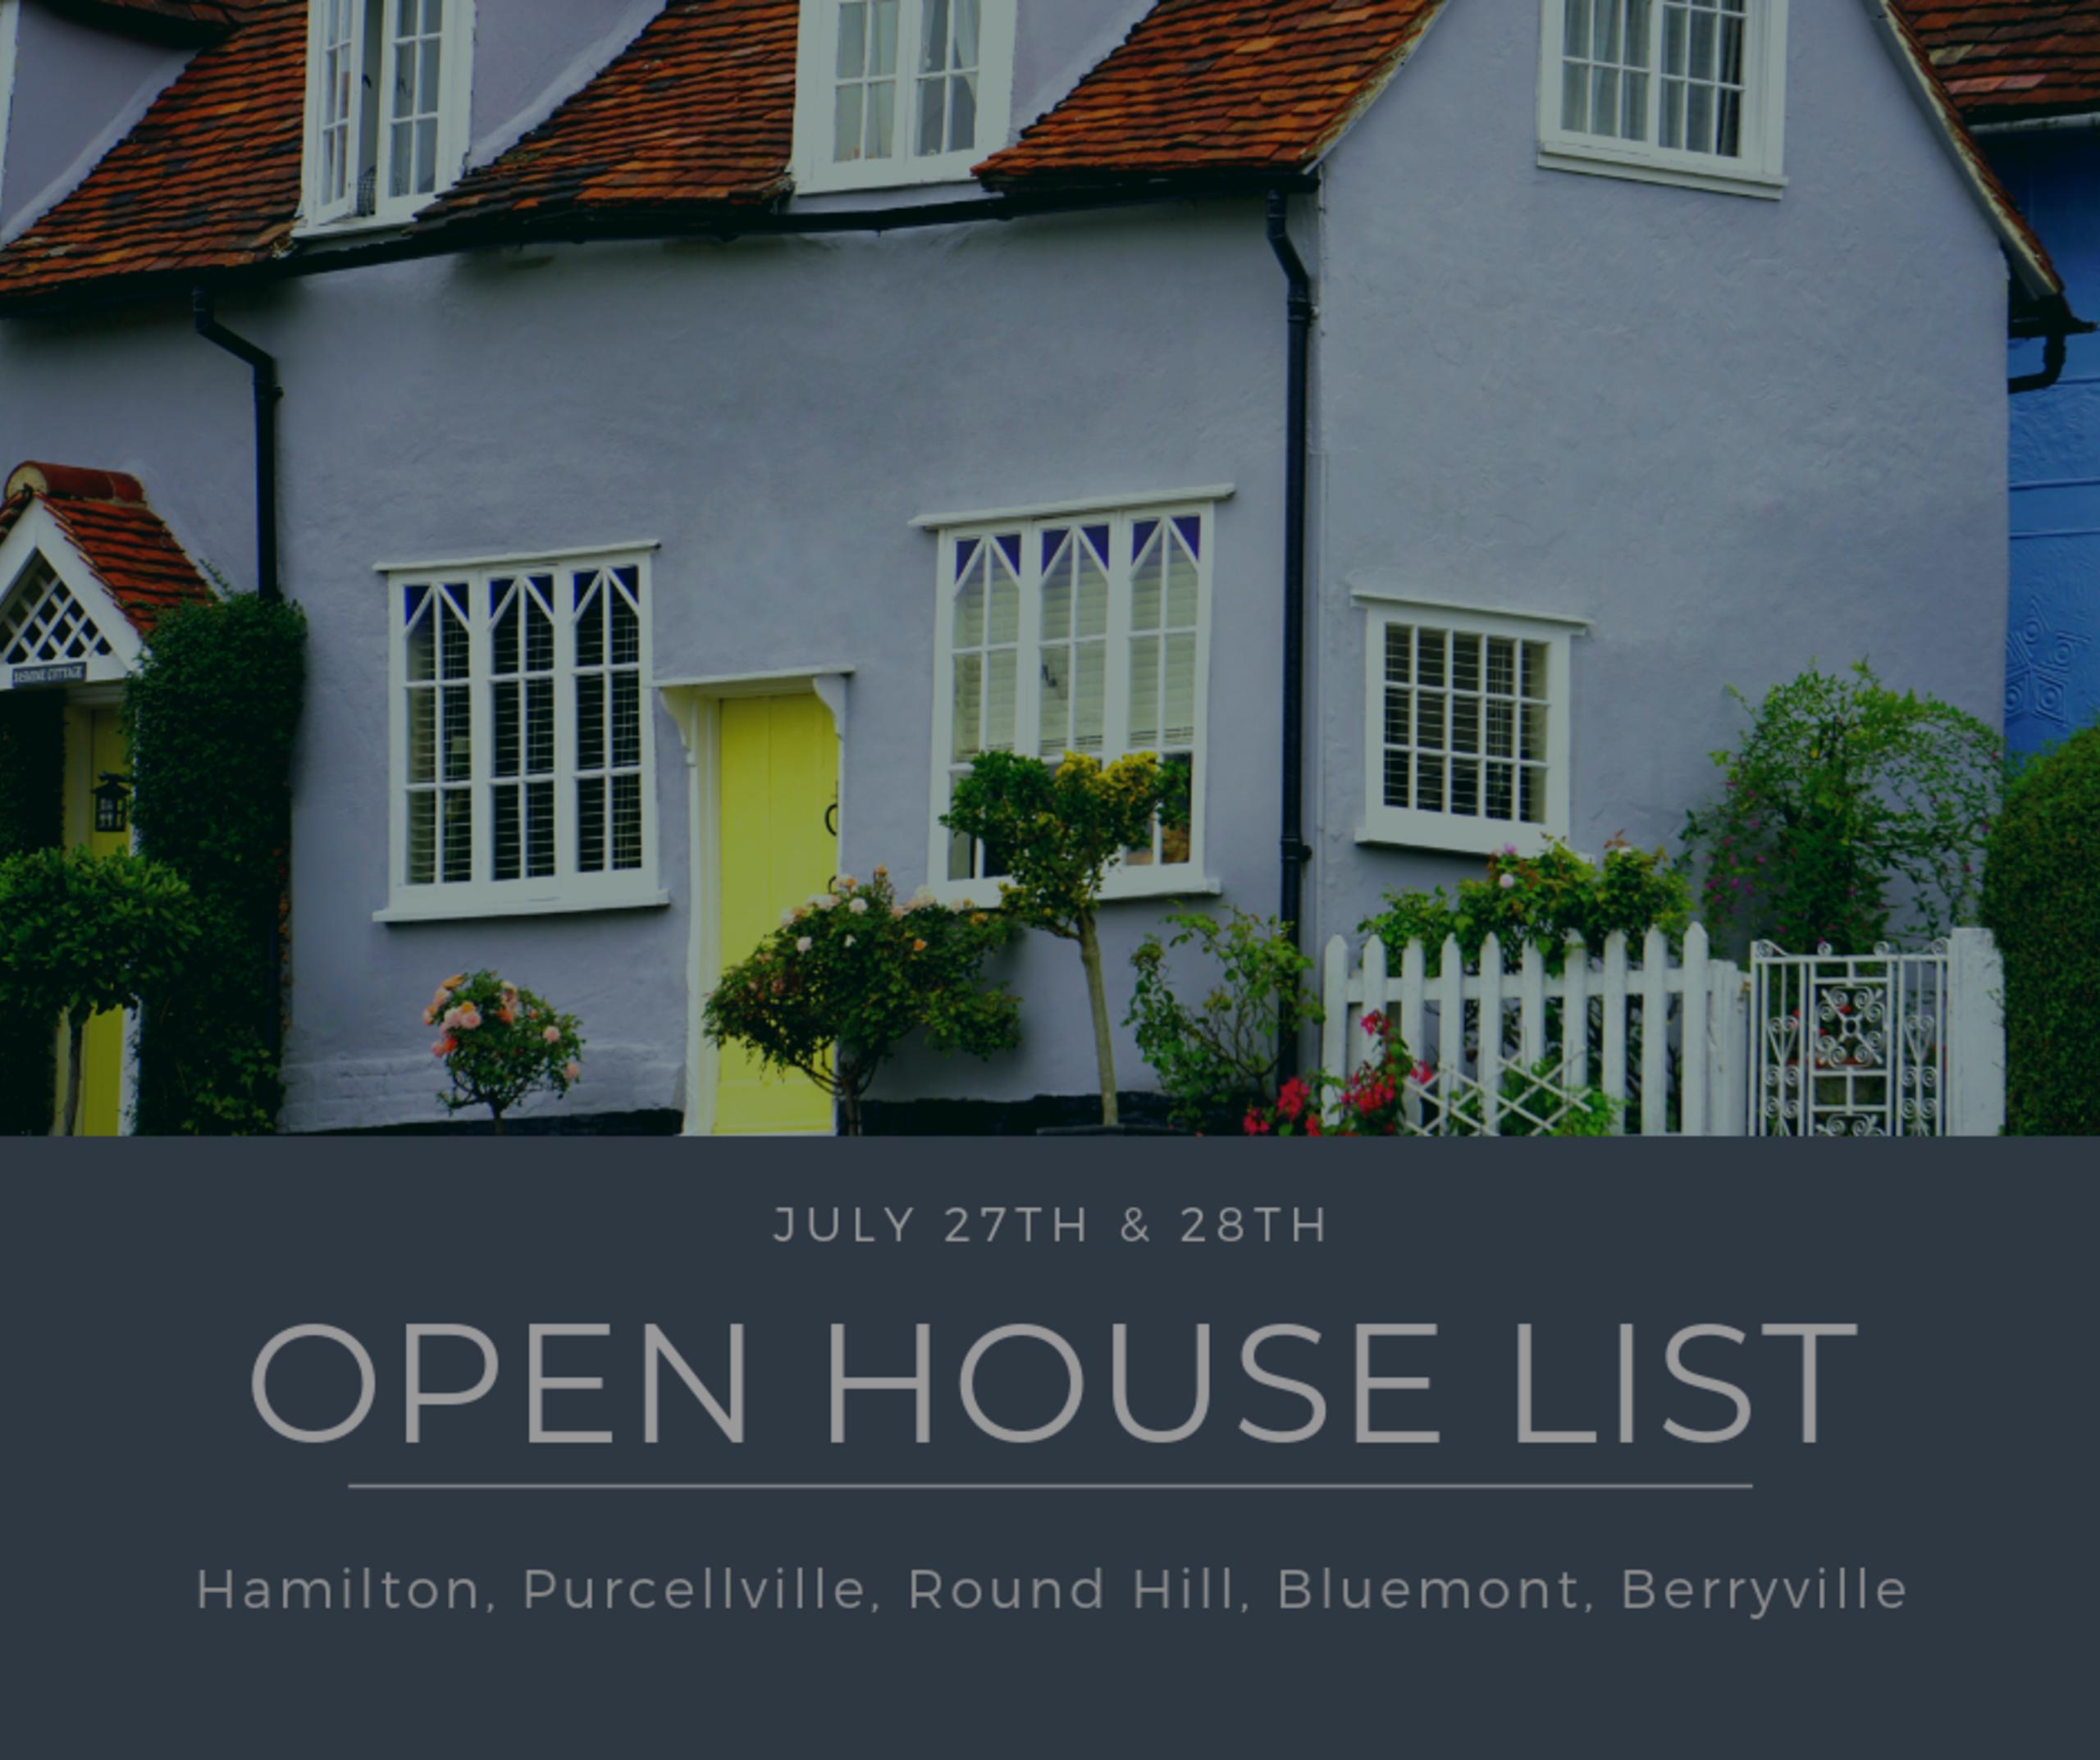 Open House List 7/27/19 – 7/28/19